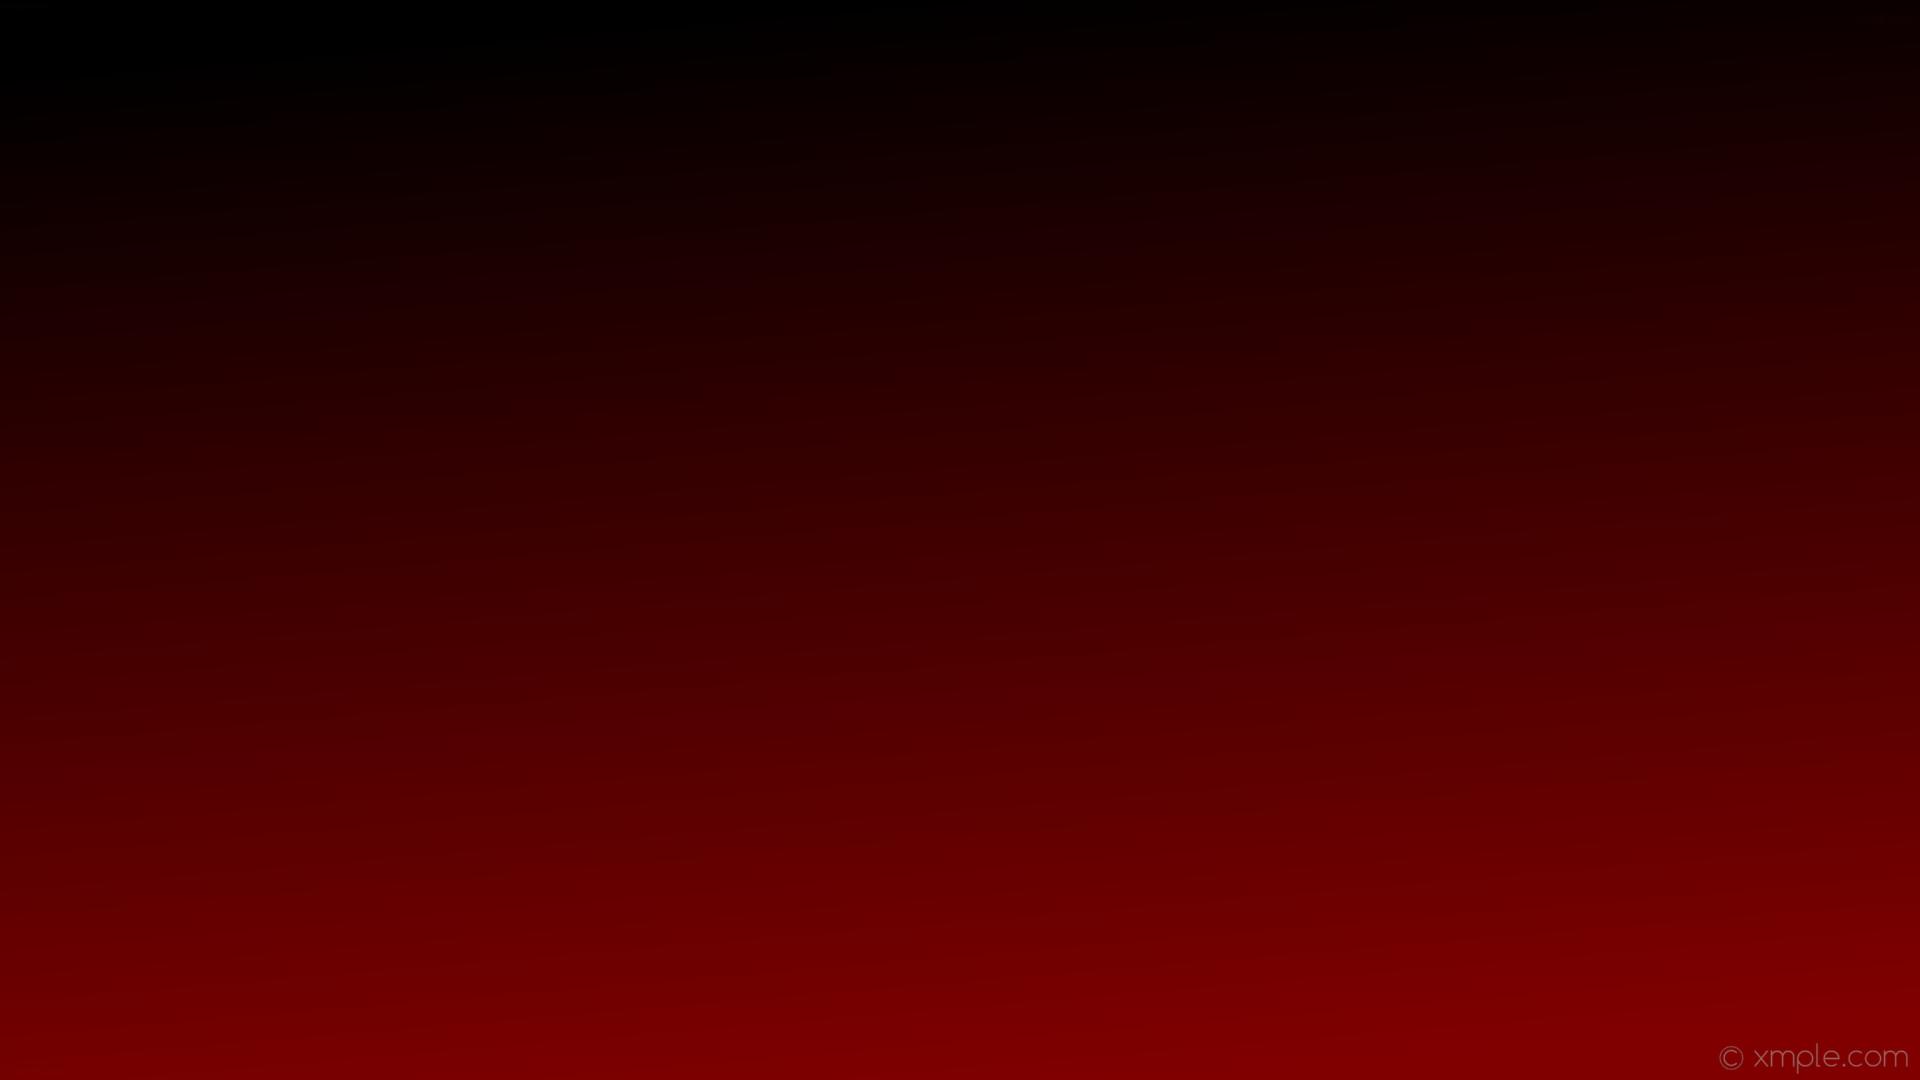 1920x1080 Wallpaper Black Brown Gradient Linear Maroon 000000 800000 105A